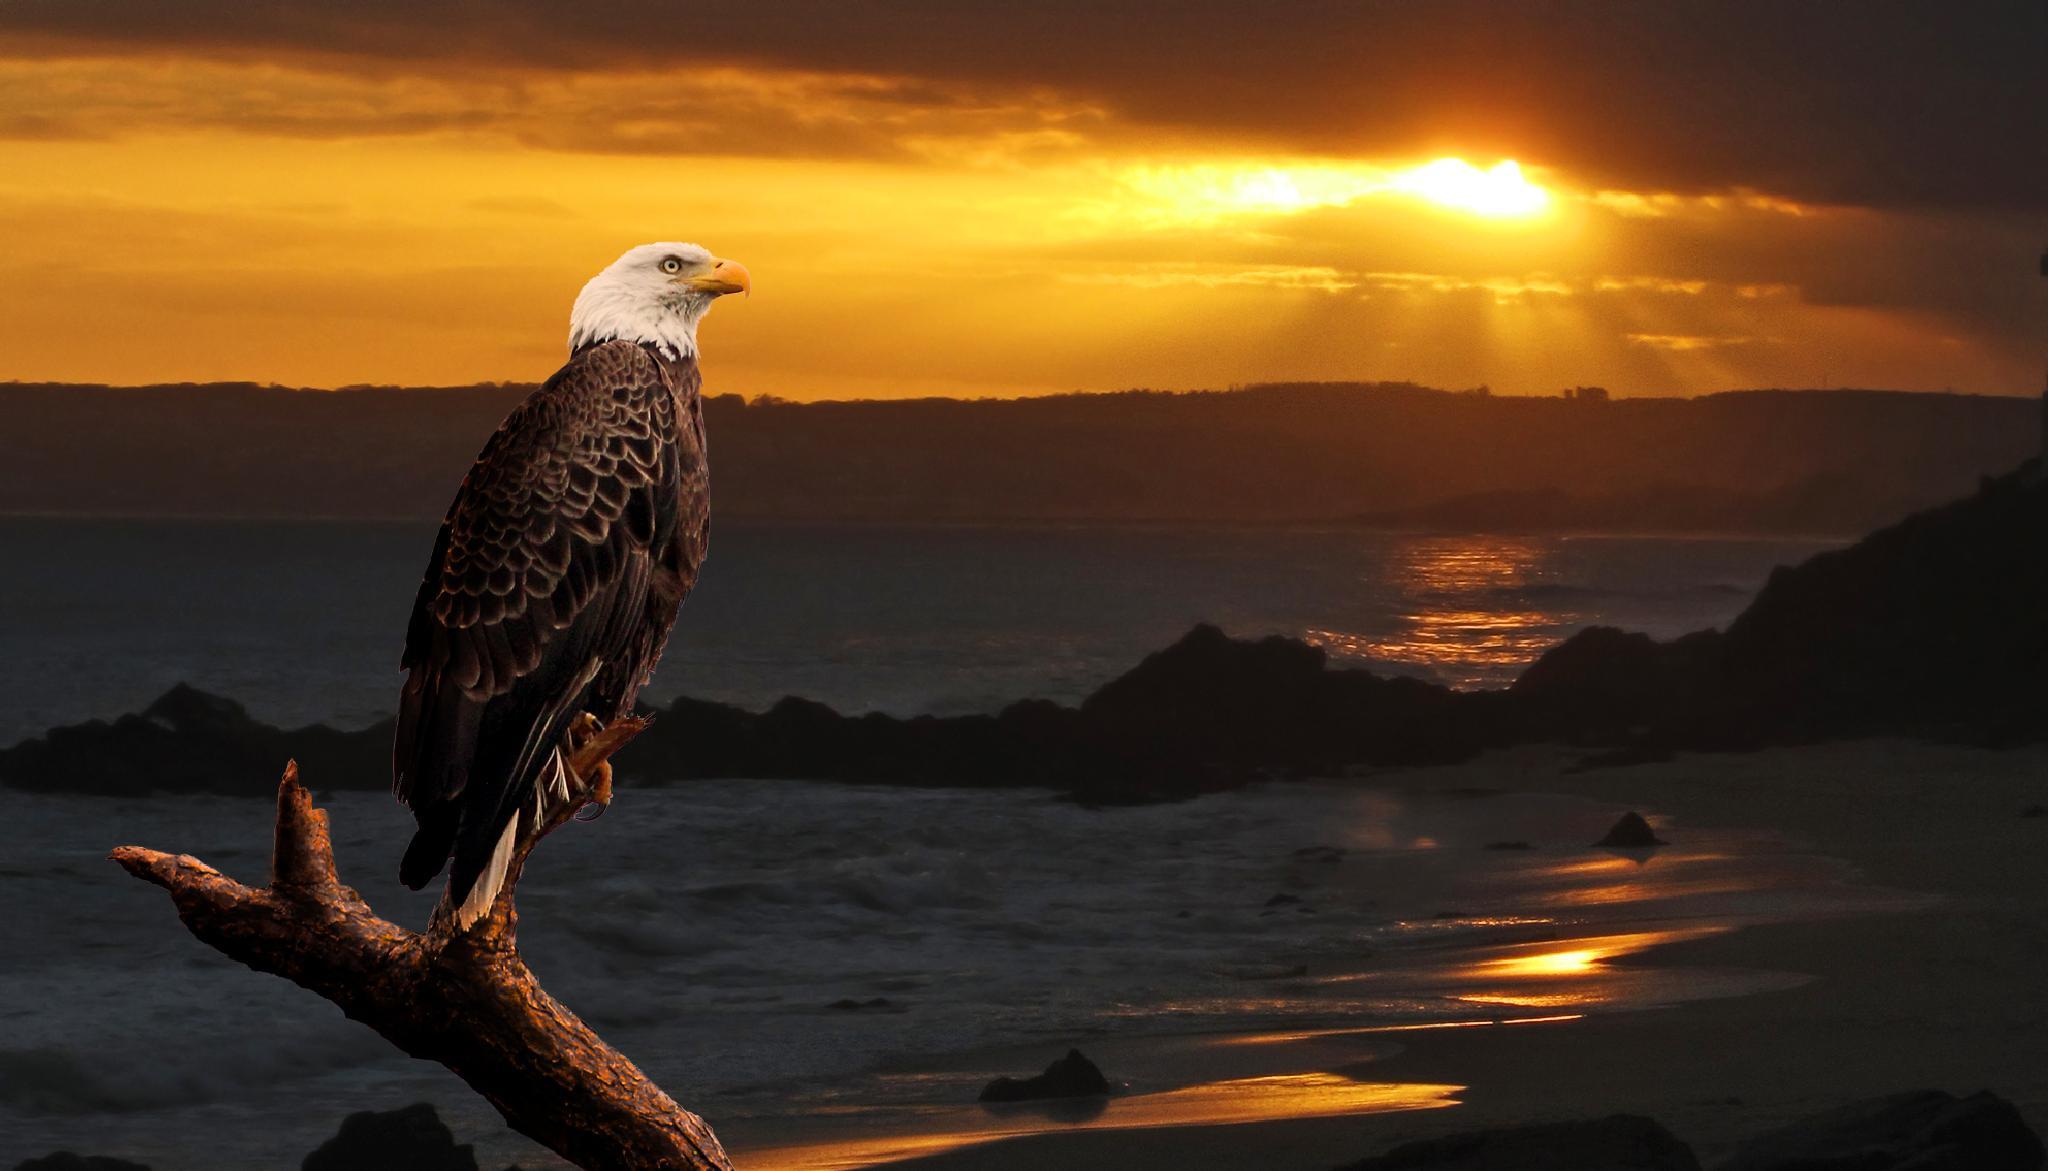 Bald Eagle watching the sun go down. by Jan Versteeg